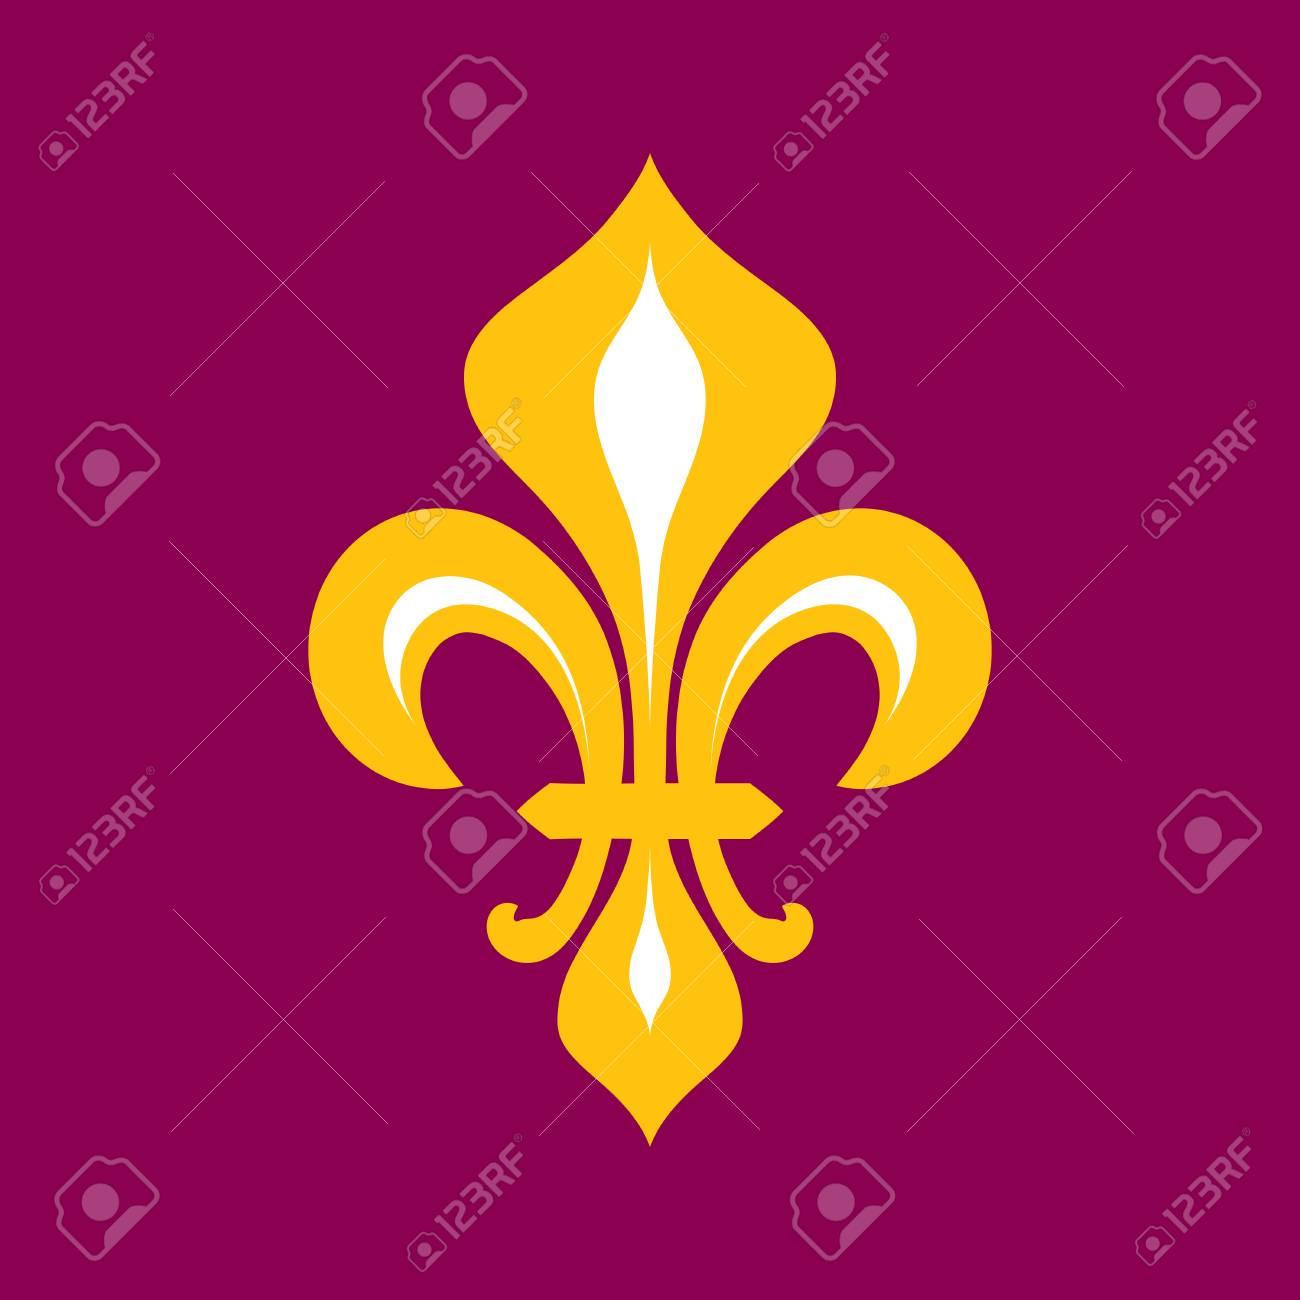 Fleur de lys flower de luce royal heraldic lily the symbol fleur de lys flower de luce royal heraldic lily the biocorpaavc